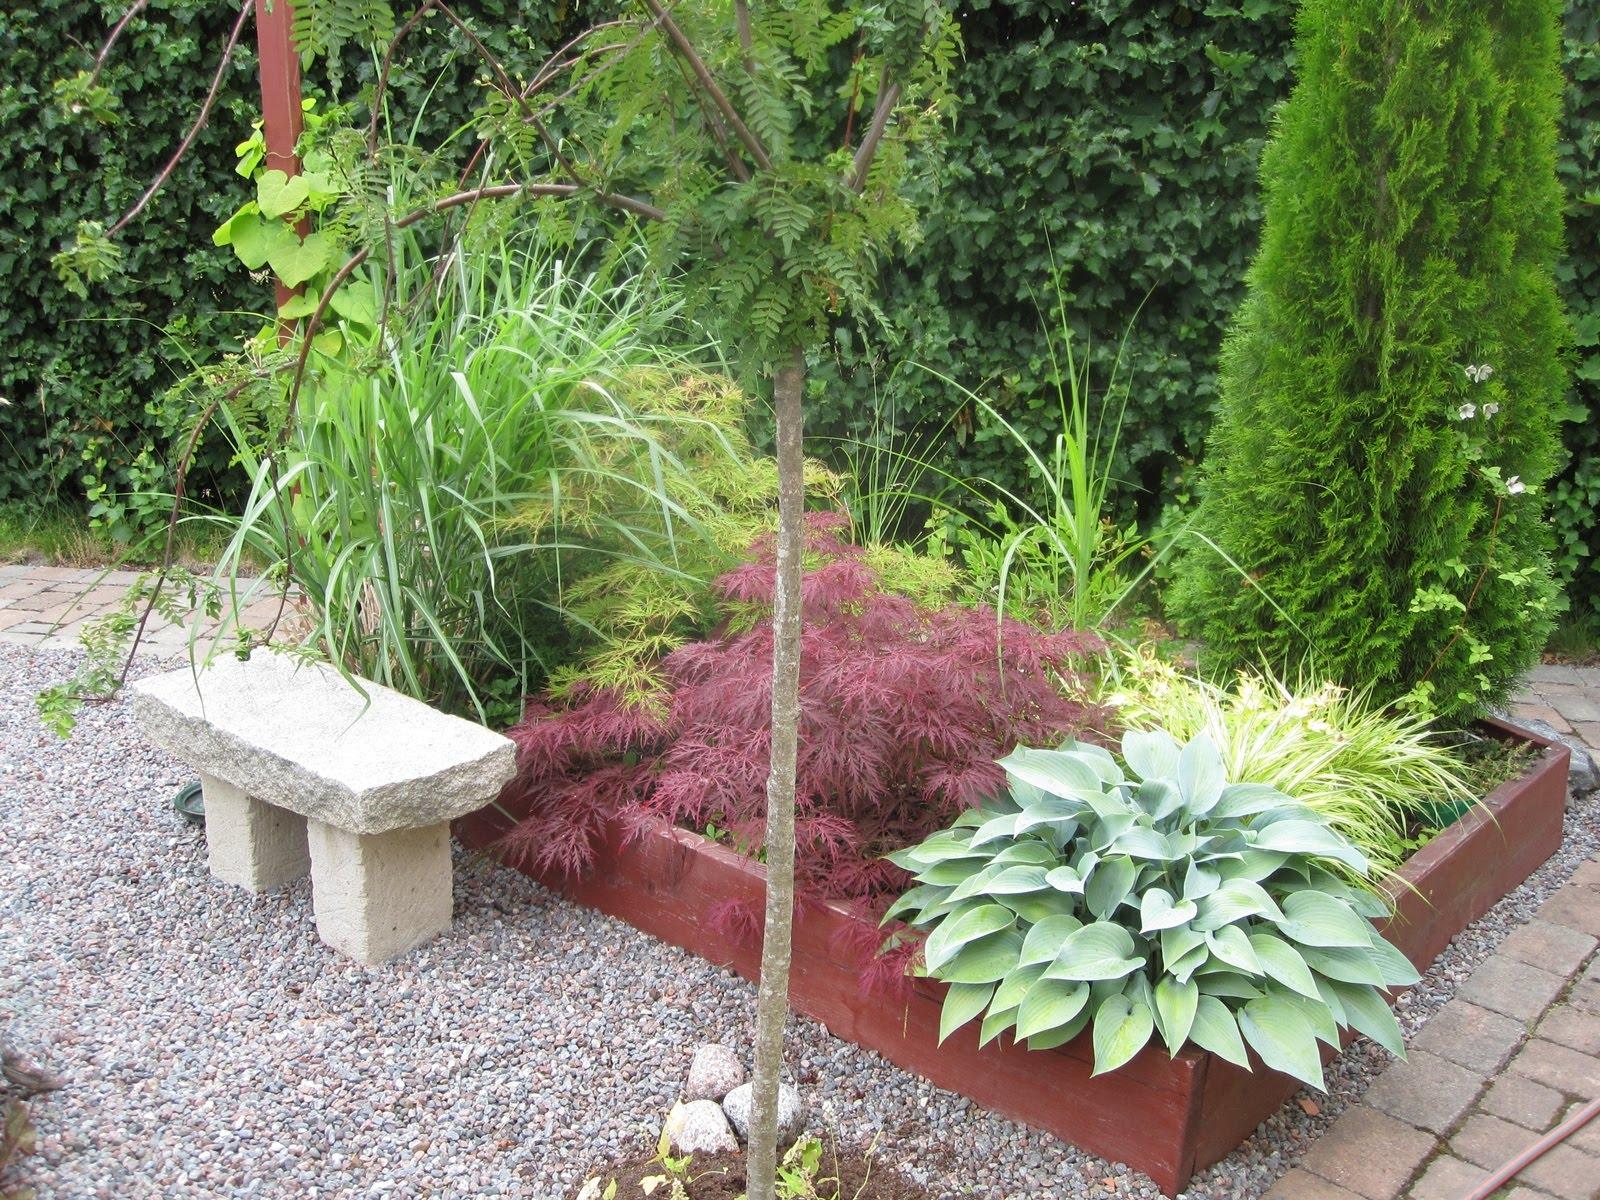 Trädgård Grus : Trädgårdstina syrrans trädgård